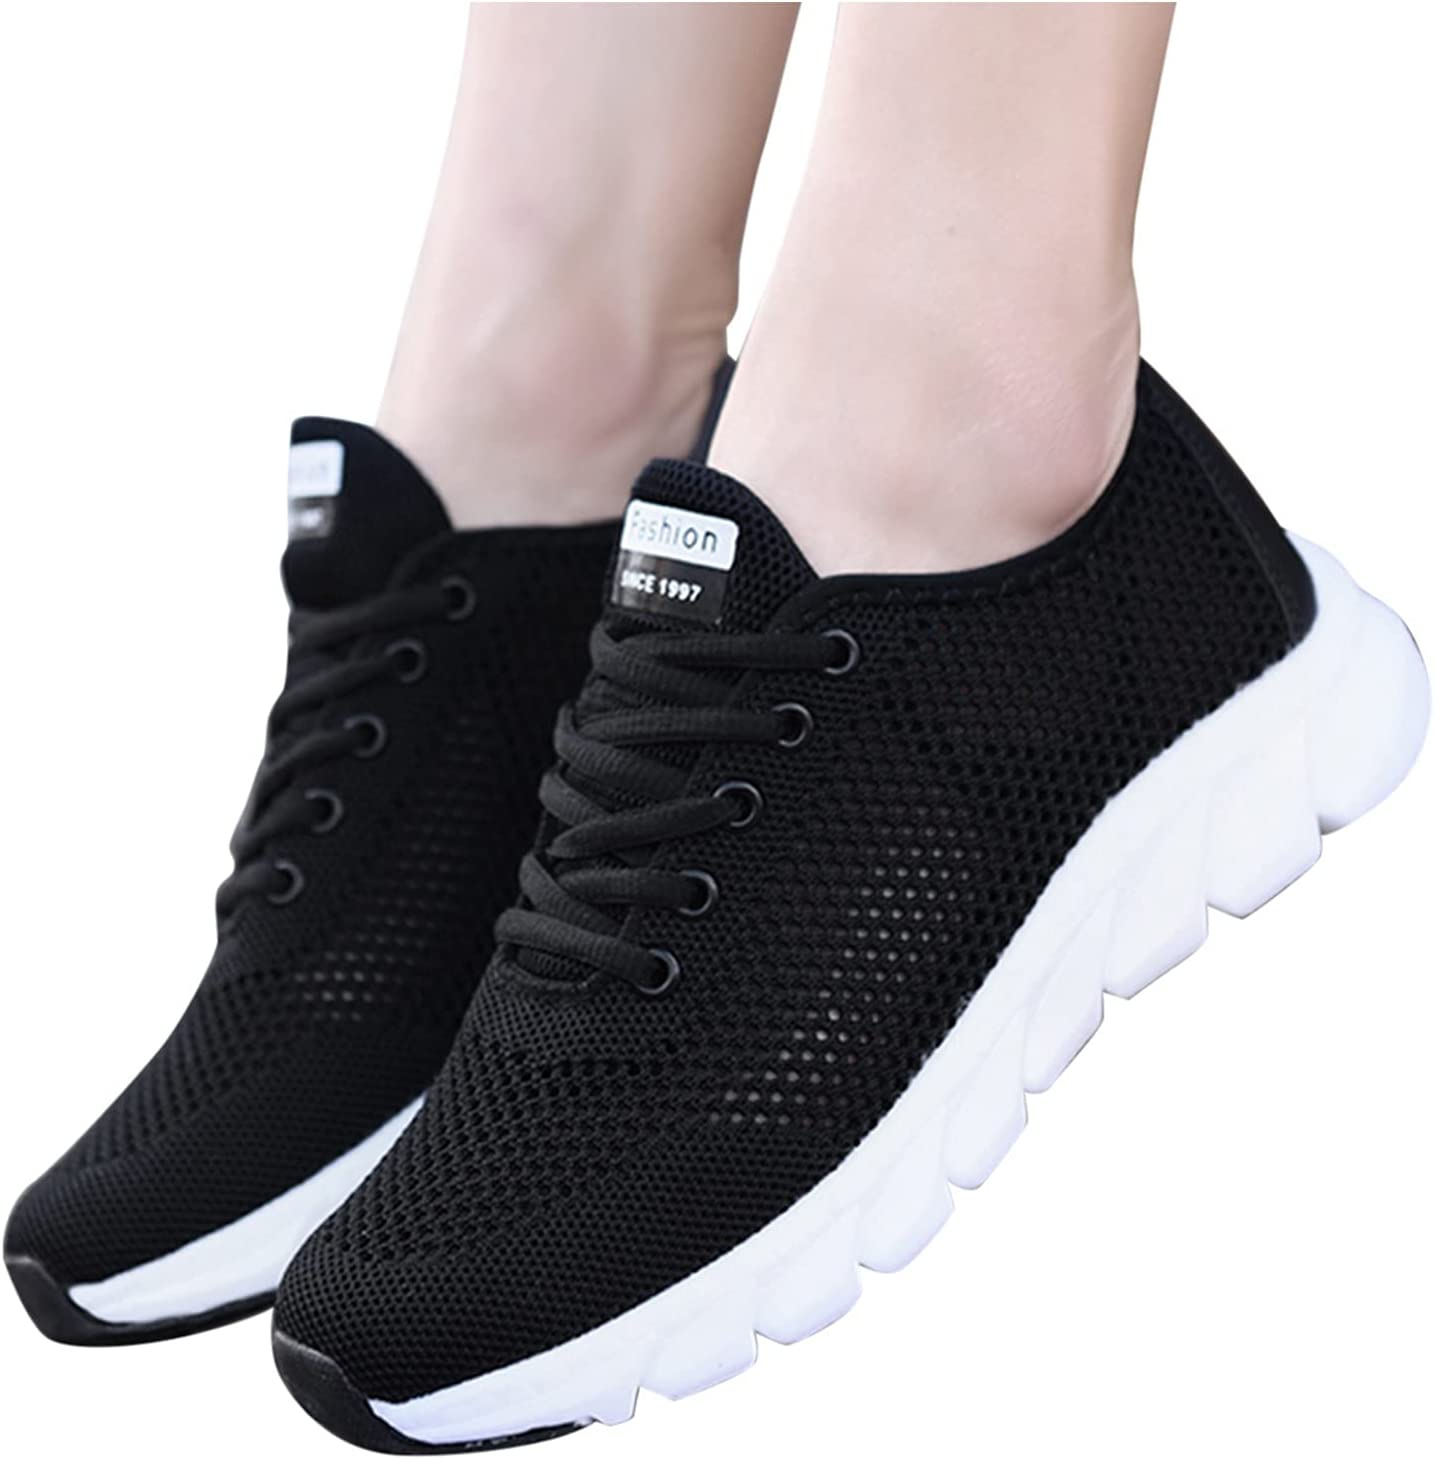 Women's FashionSneaker Women Lightweight Sneaker Stylish Athletic Shoes Mesh Comfy Slip-on Shoes Casual Walking Sandal